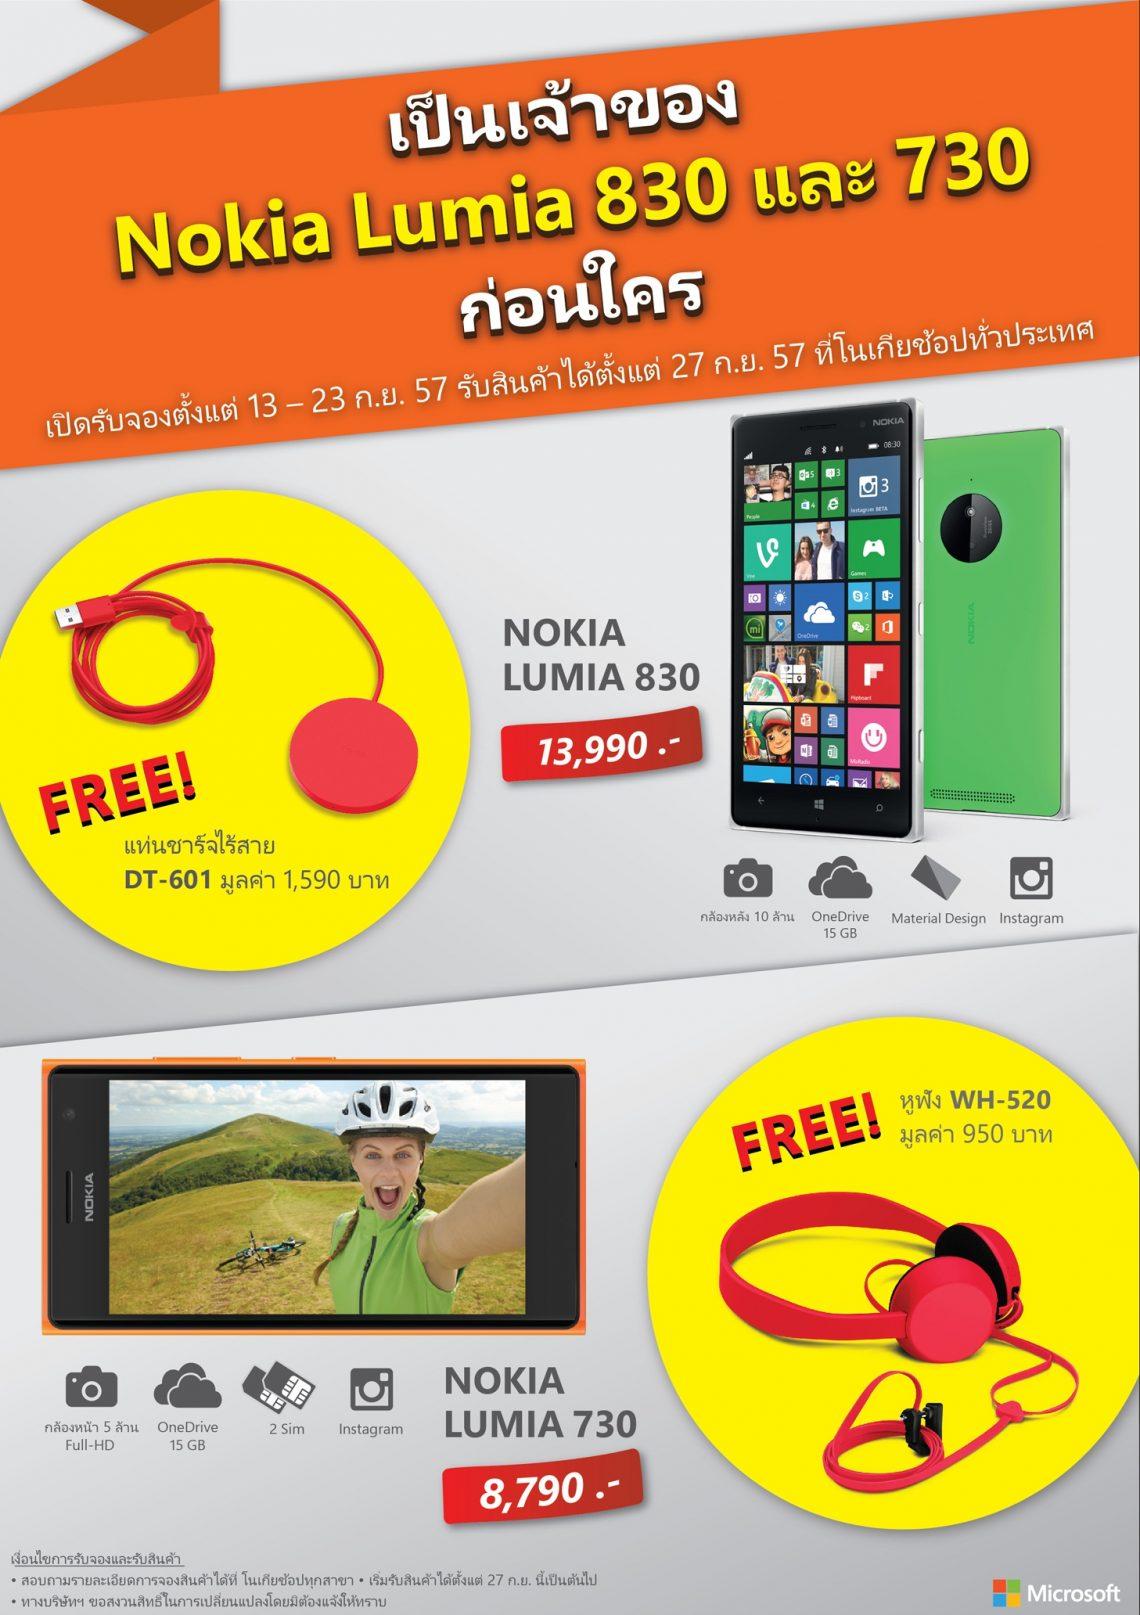 [PR] ไมโครซอฟท์เปิดจอง Lumia 830 และ Lumia 730 สองสมาร์ทโฟนใหม่กับซอฟต์แวร์ล่าสุด ขั้นกว่าของการถ่ายภาพในราคาเอื้อมถึง